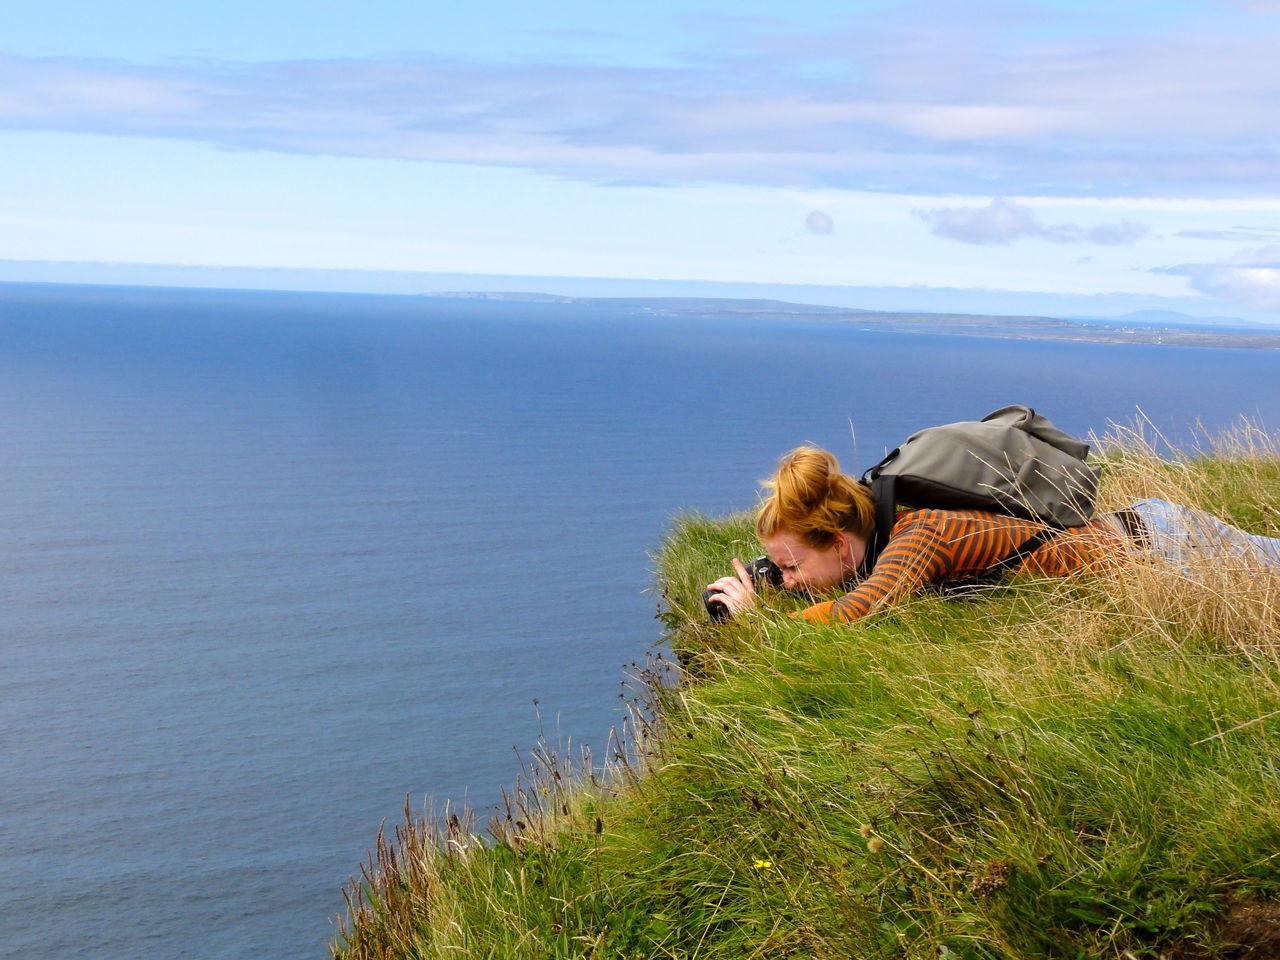 Beautiful stock photos of irland, 25-29 Years, Backpack, Beauty In Nature, Camera - Photographic Equipment